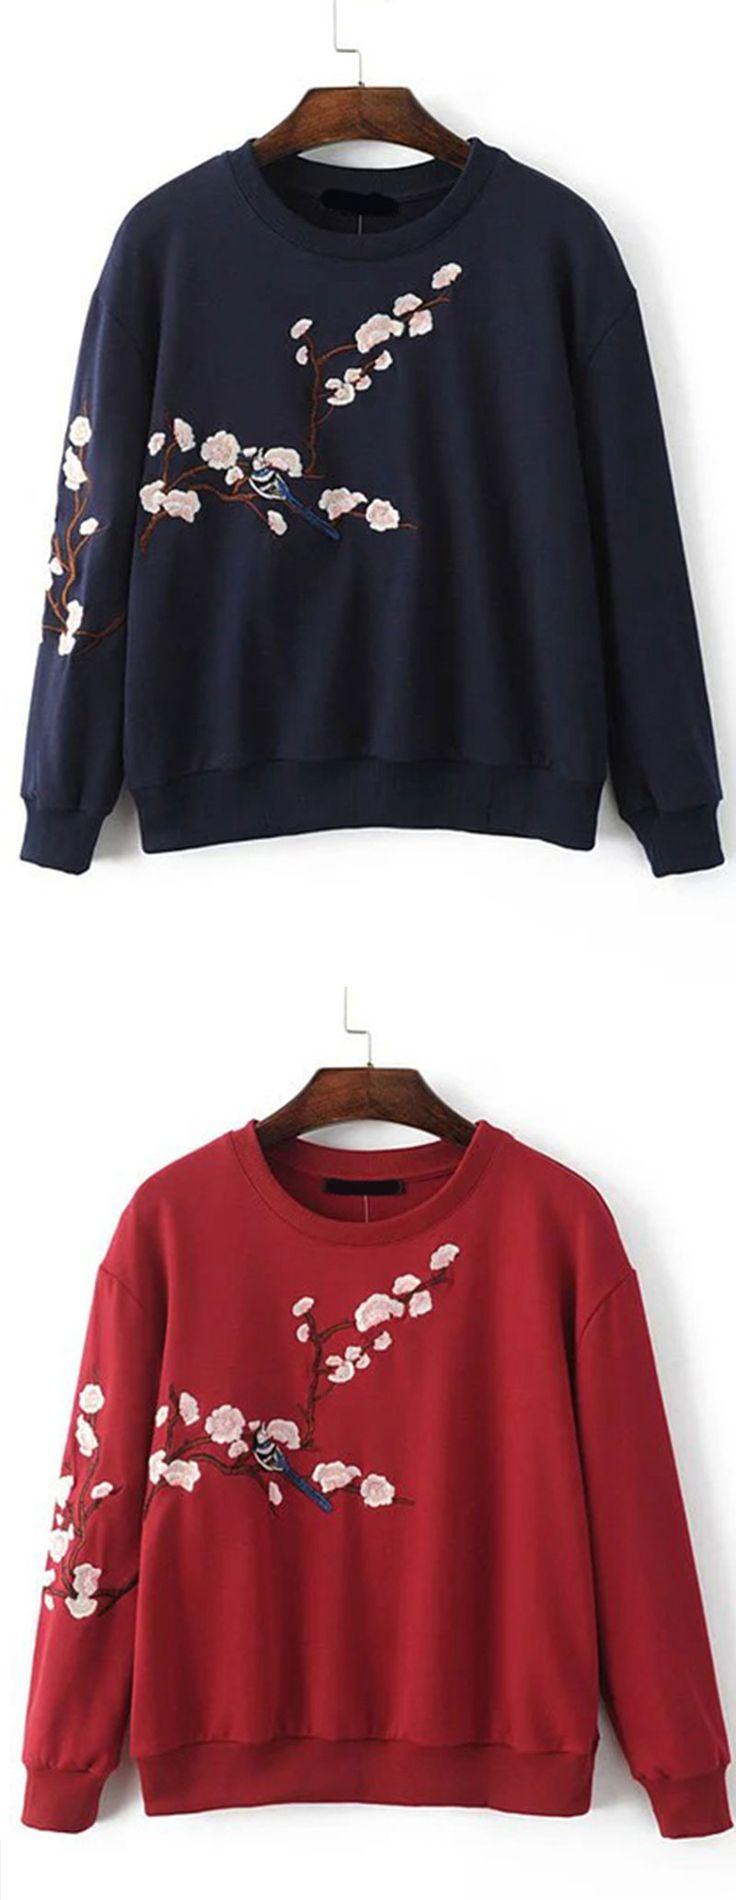 Navy & Red Flower Embroidery Drop Shoulder Sweatshirt